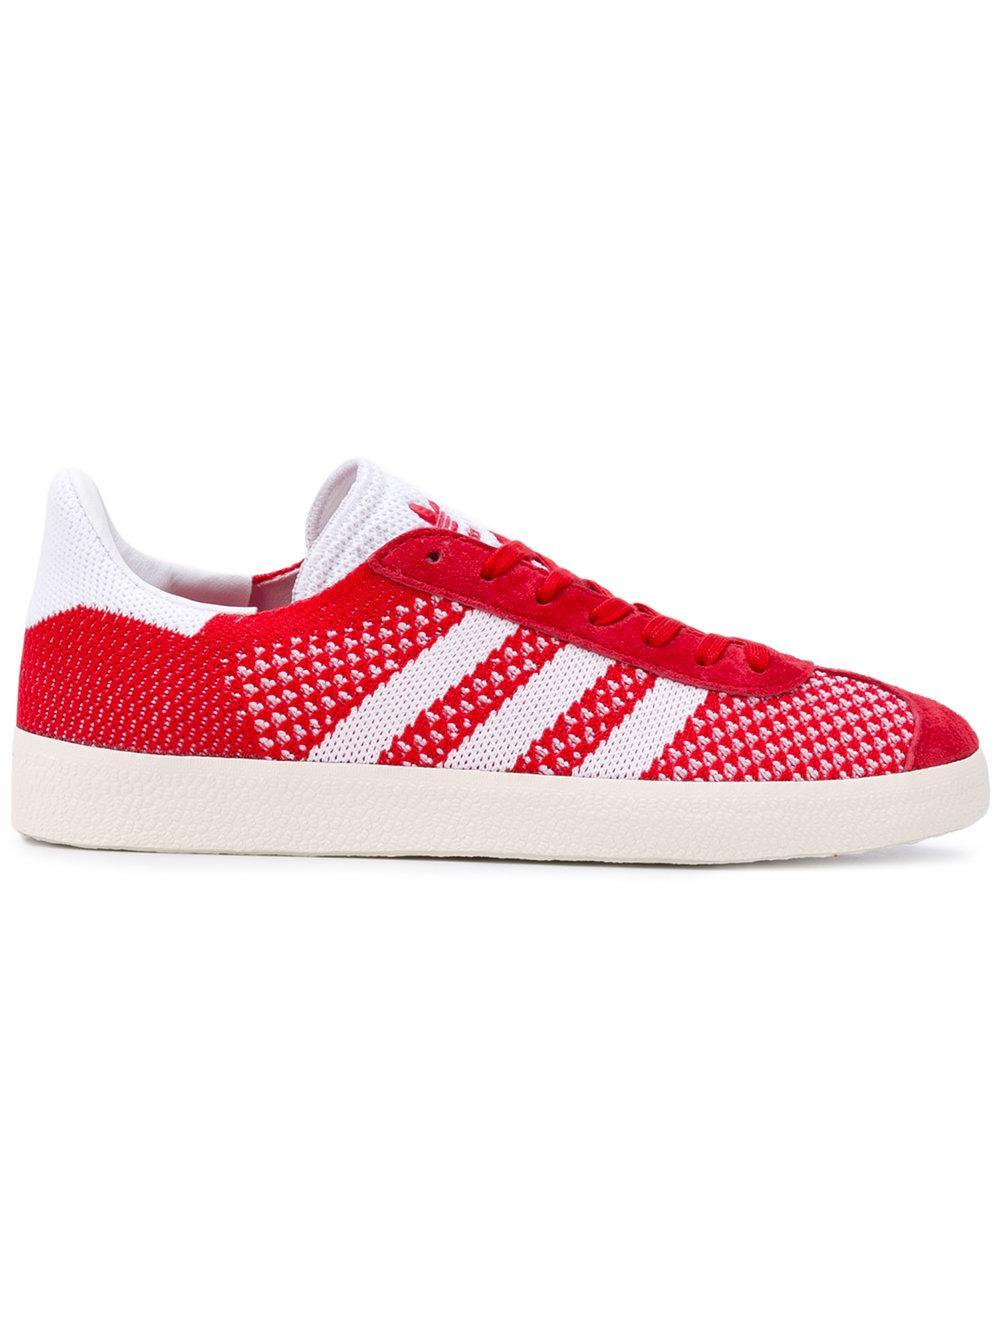 lyst adidas originals gazelle primeknit sneakers in red. Black Bedroom Furniture Sets. Home Design Ideas